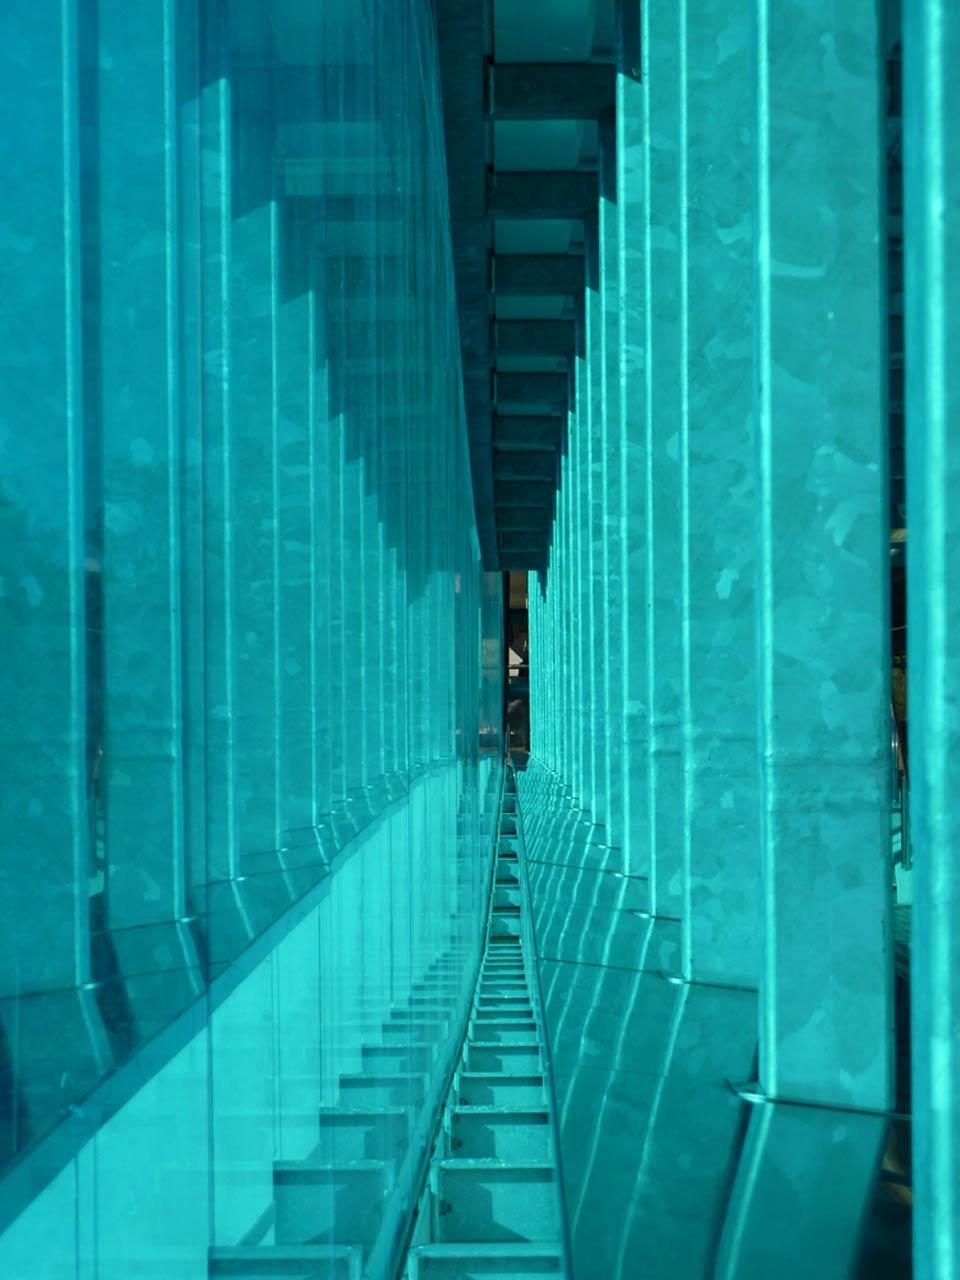 Corridors Slinge-Facade